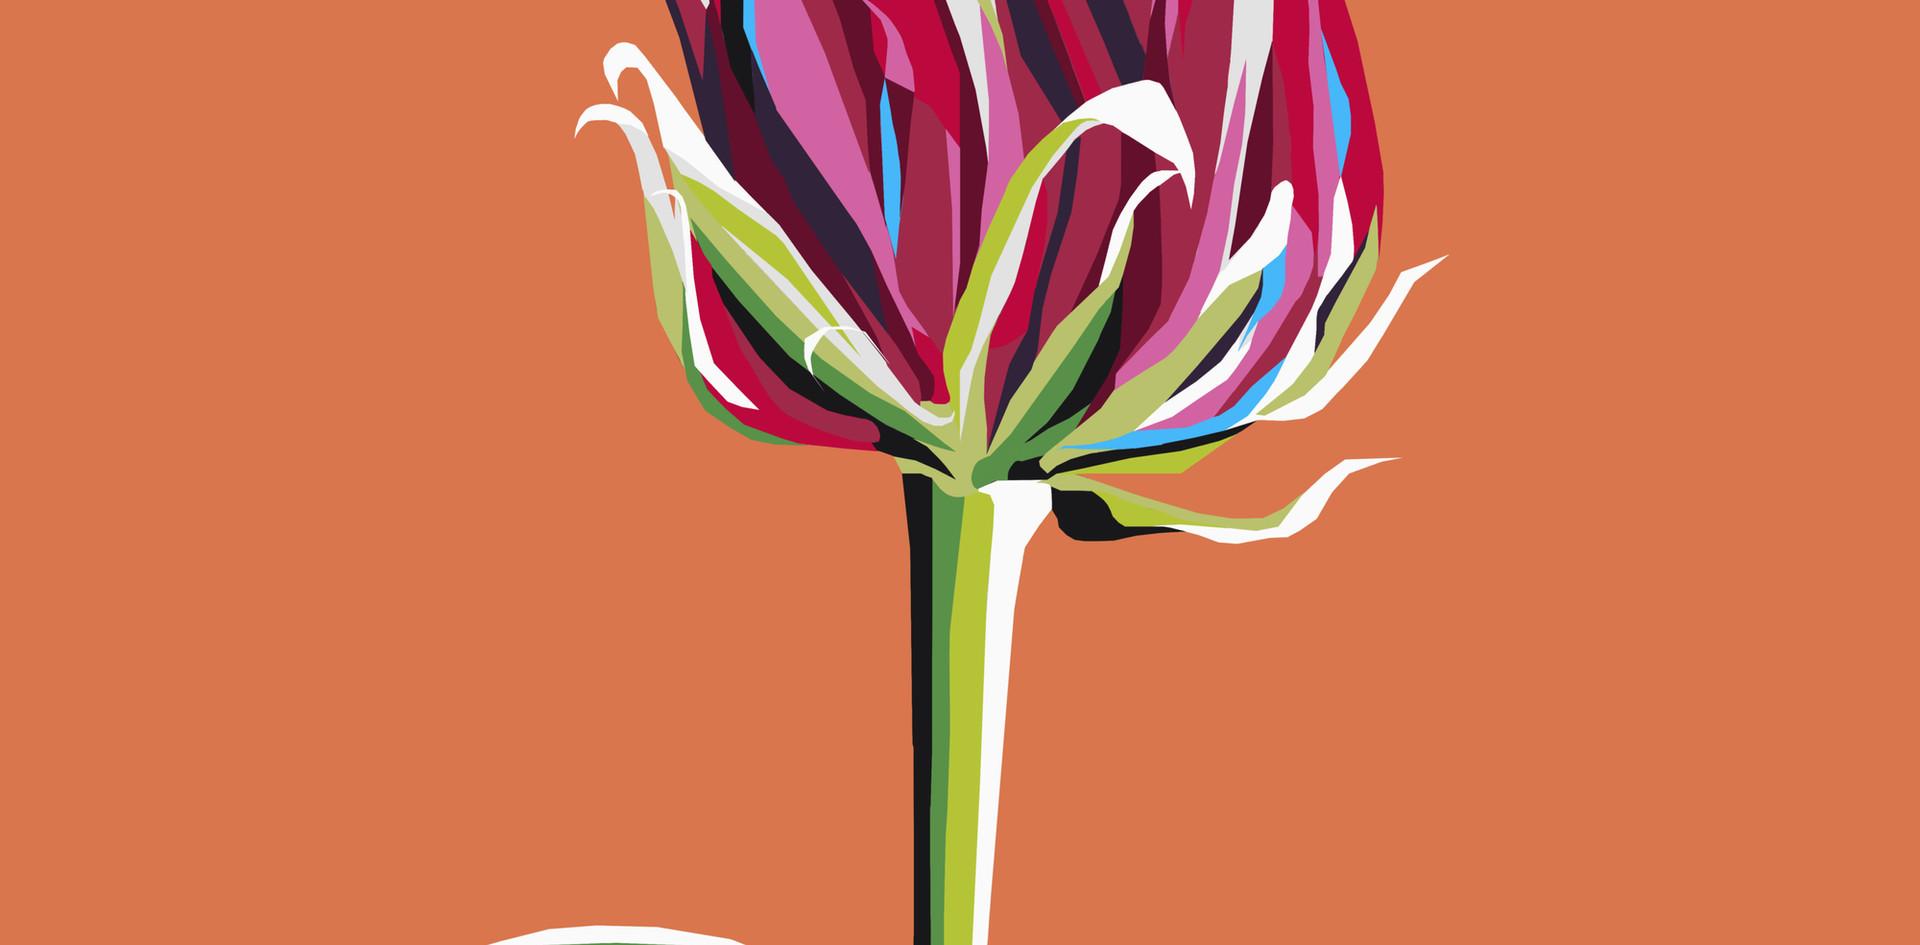 Pink Rose Digital Art.jpg